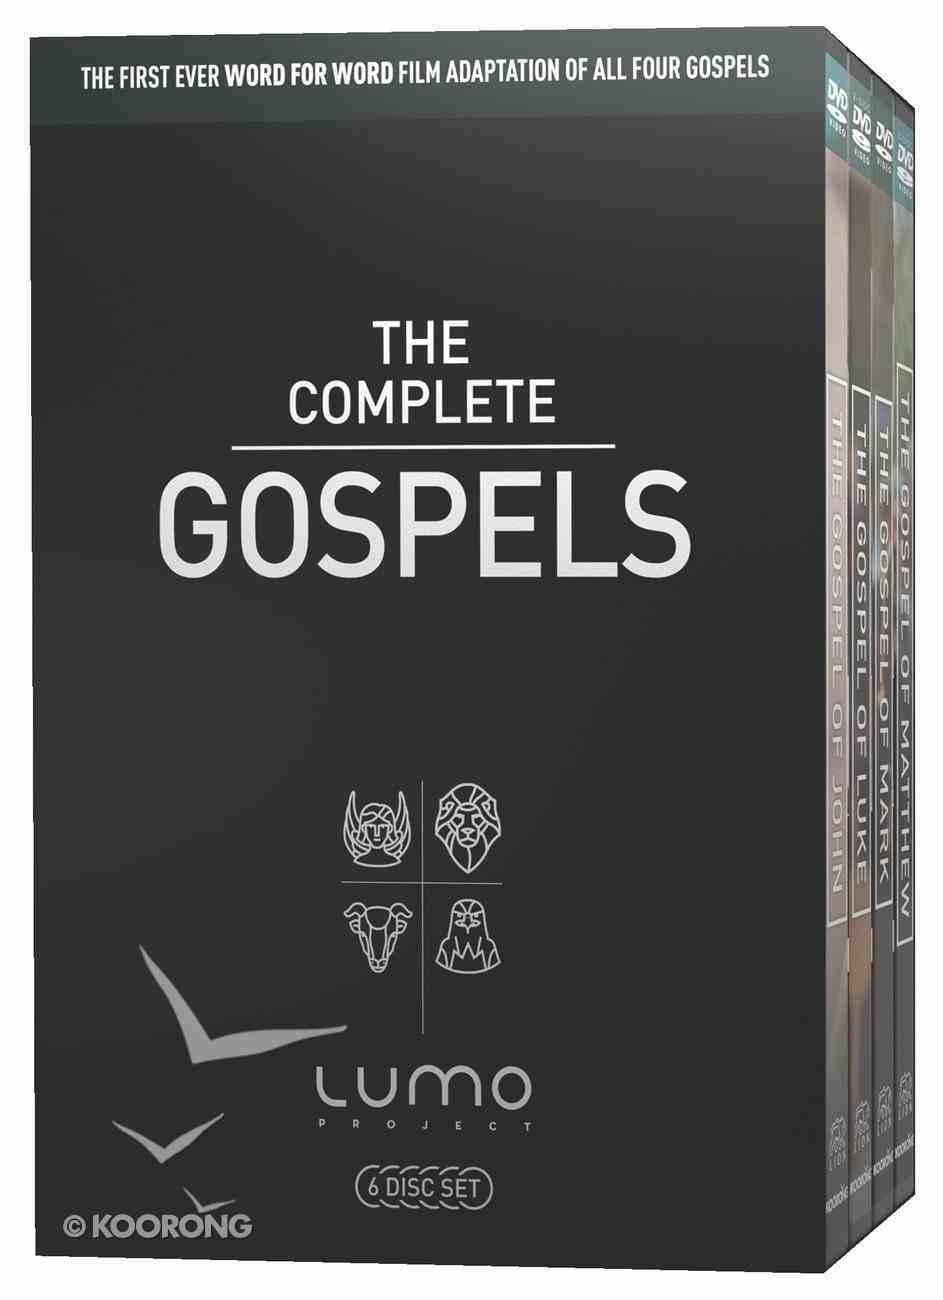 The Complete Gospels (Lumo 6-disc Set) DVD